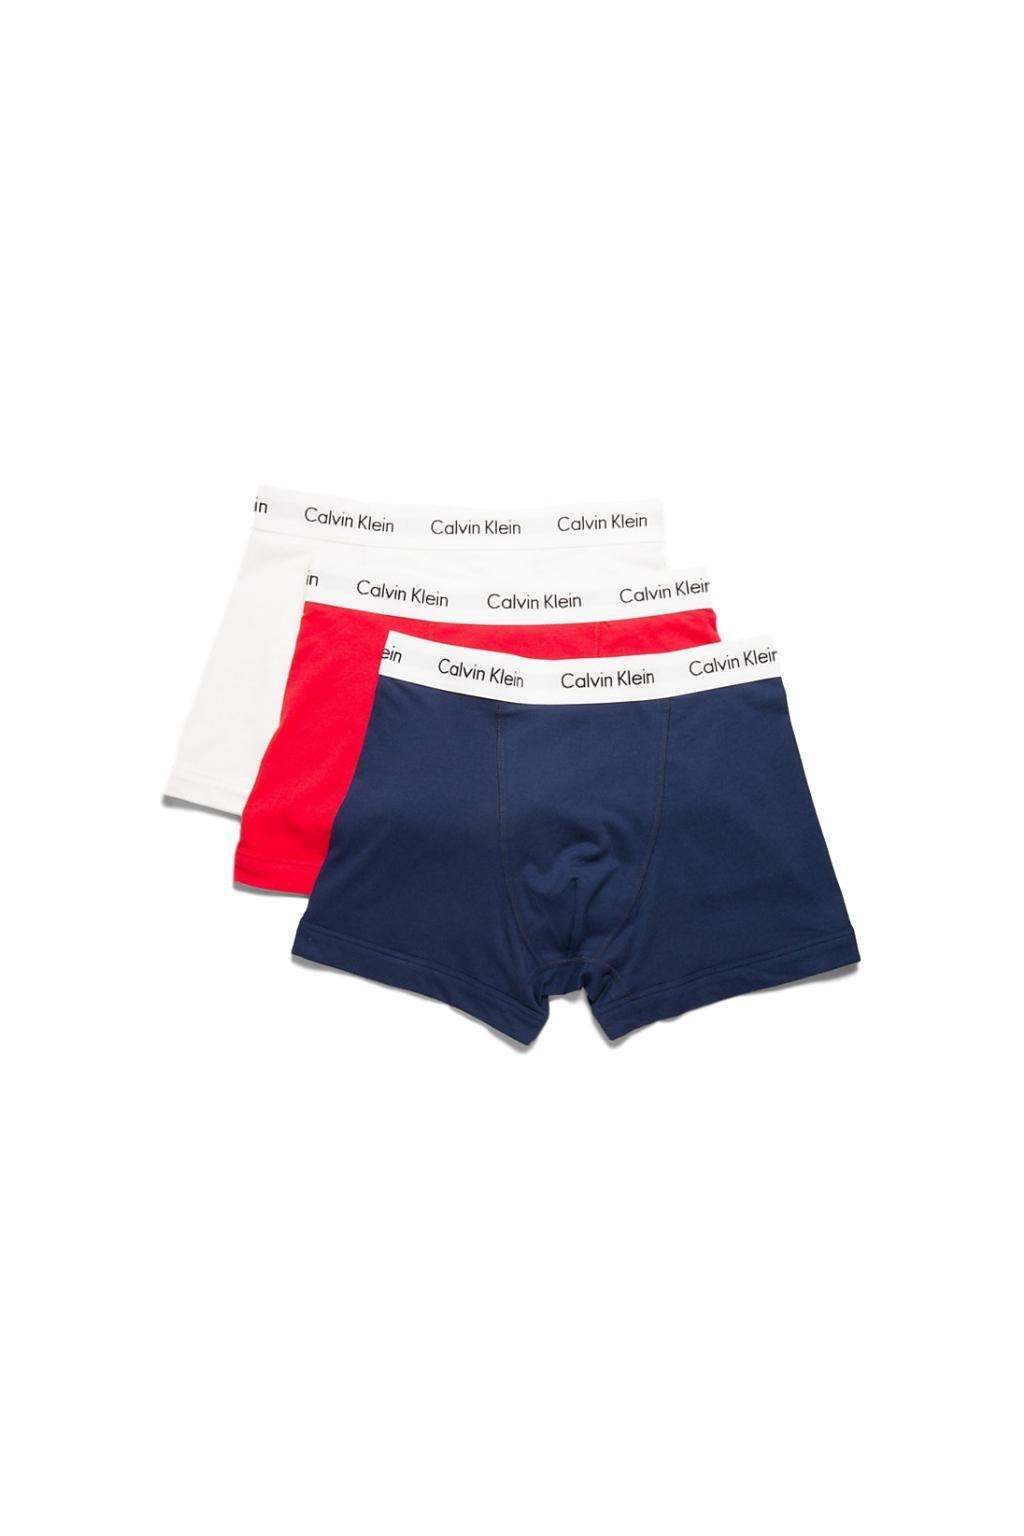 Calvin Klein Boxerky Premium 3 balení - bílá, červená, modrá